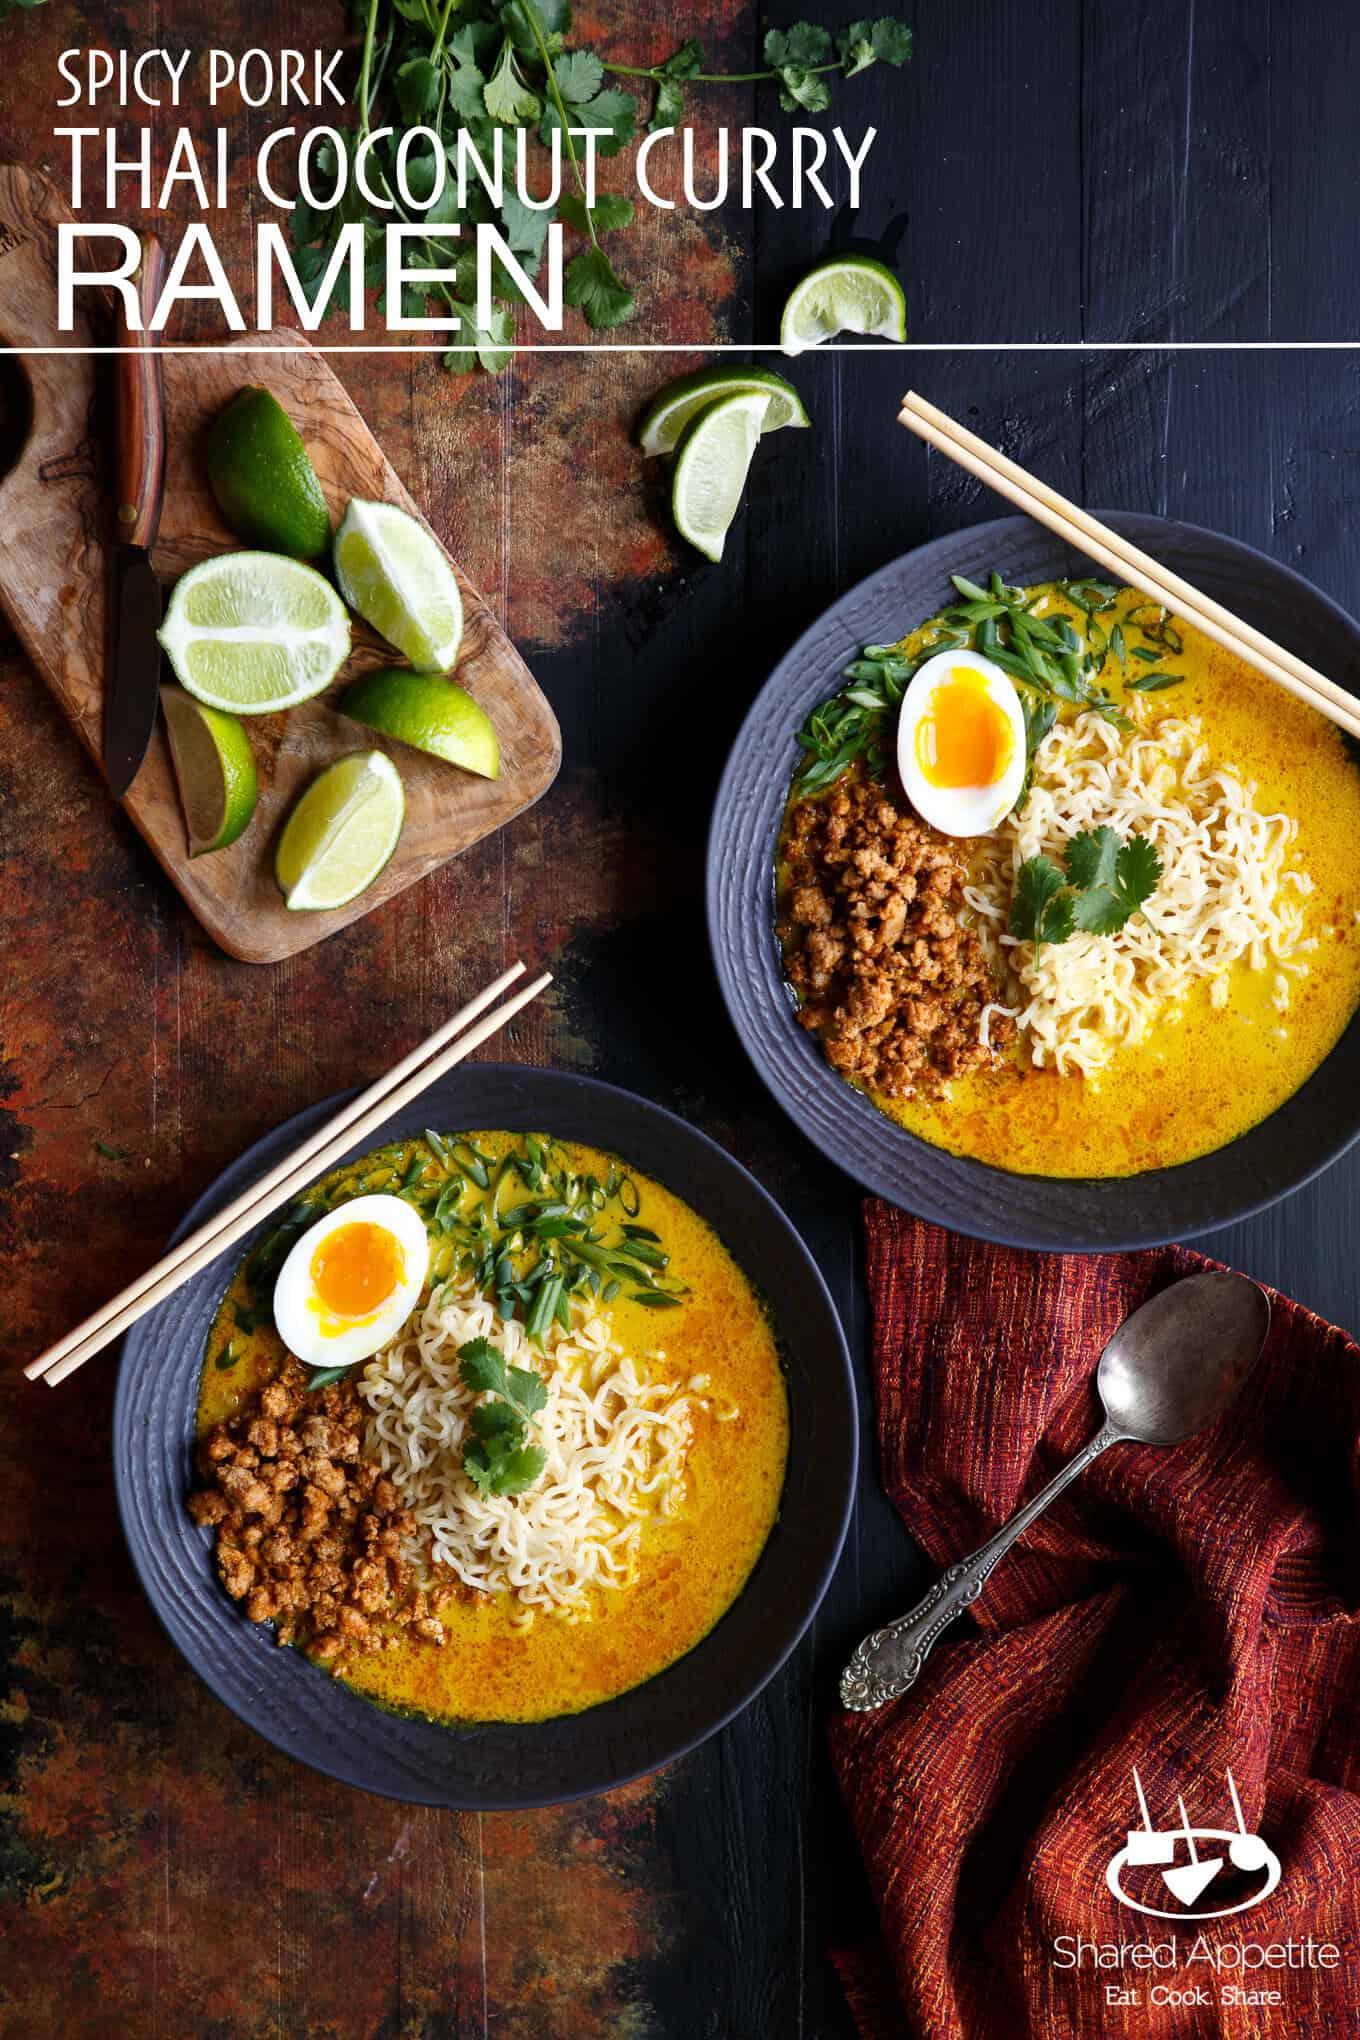 Spicy Pork Thai Coconut Curry Ramen